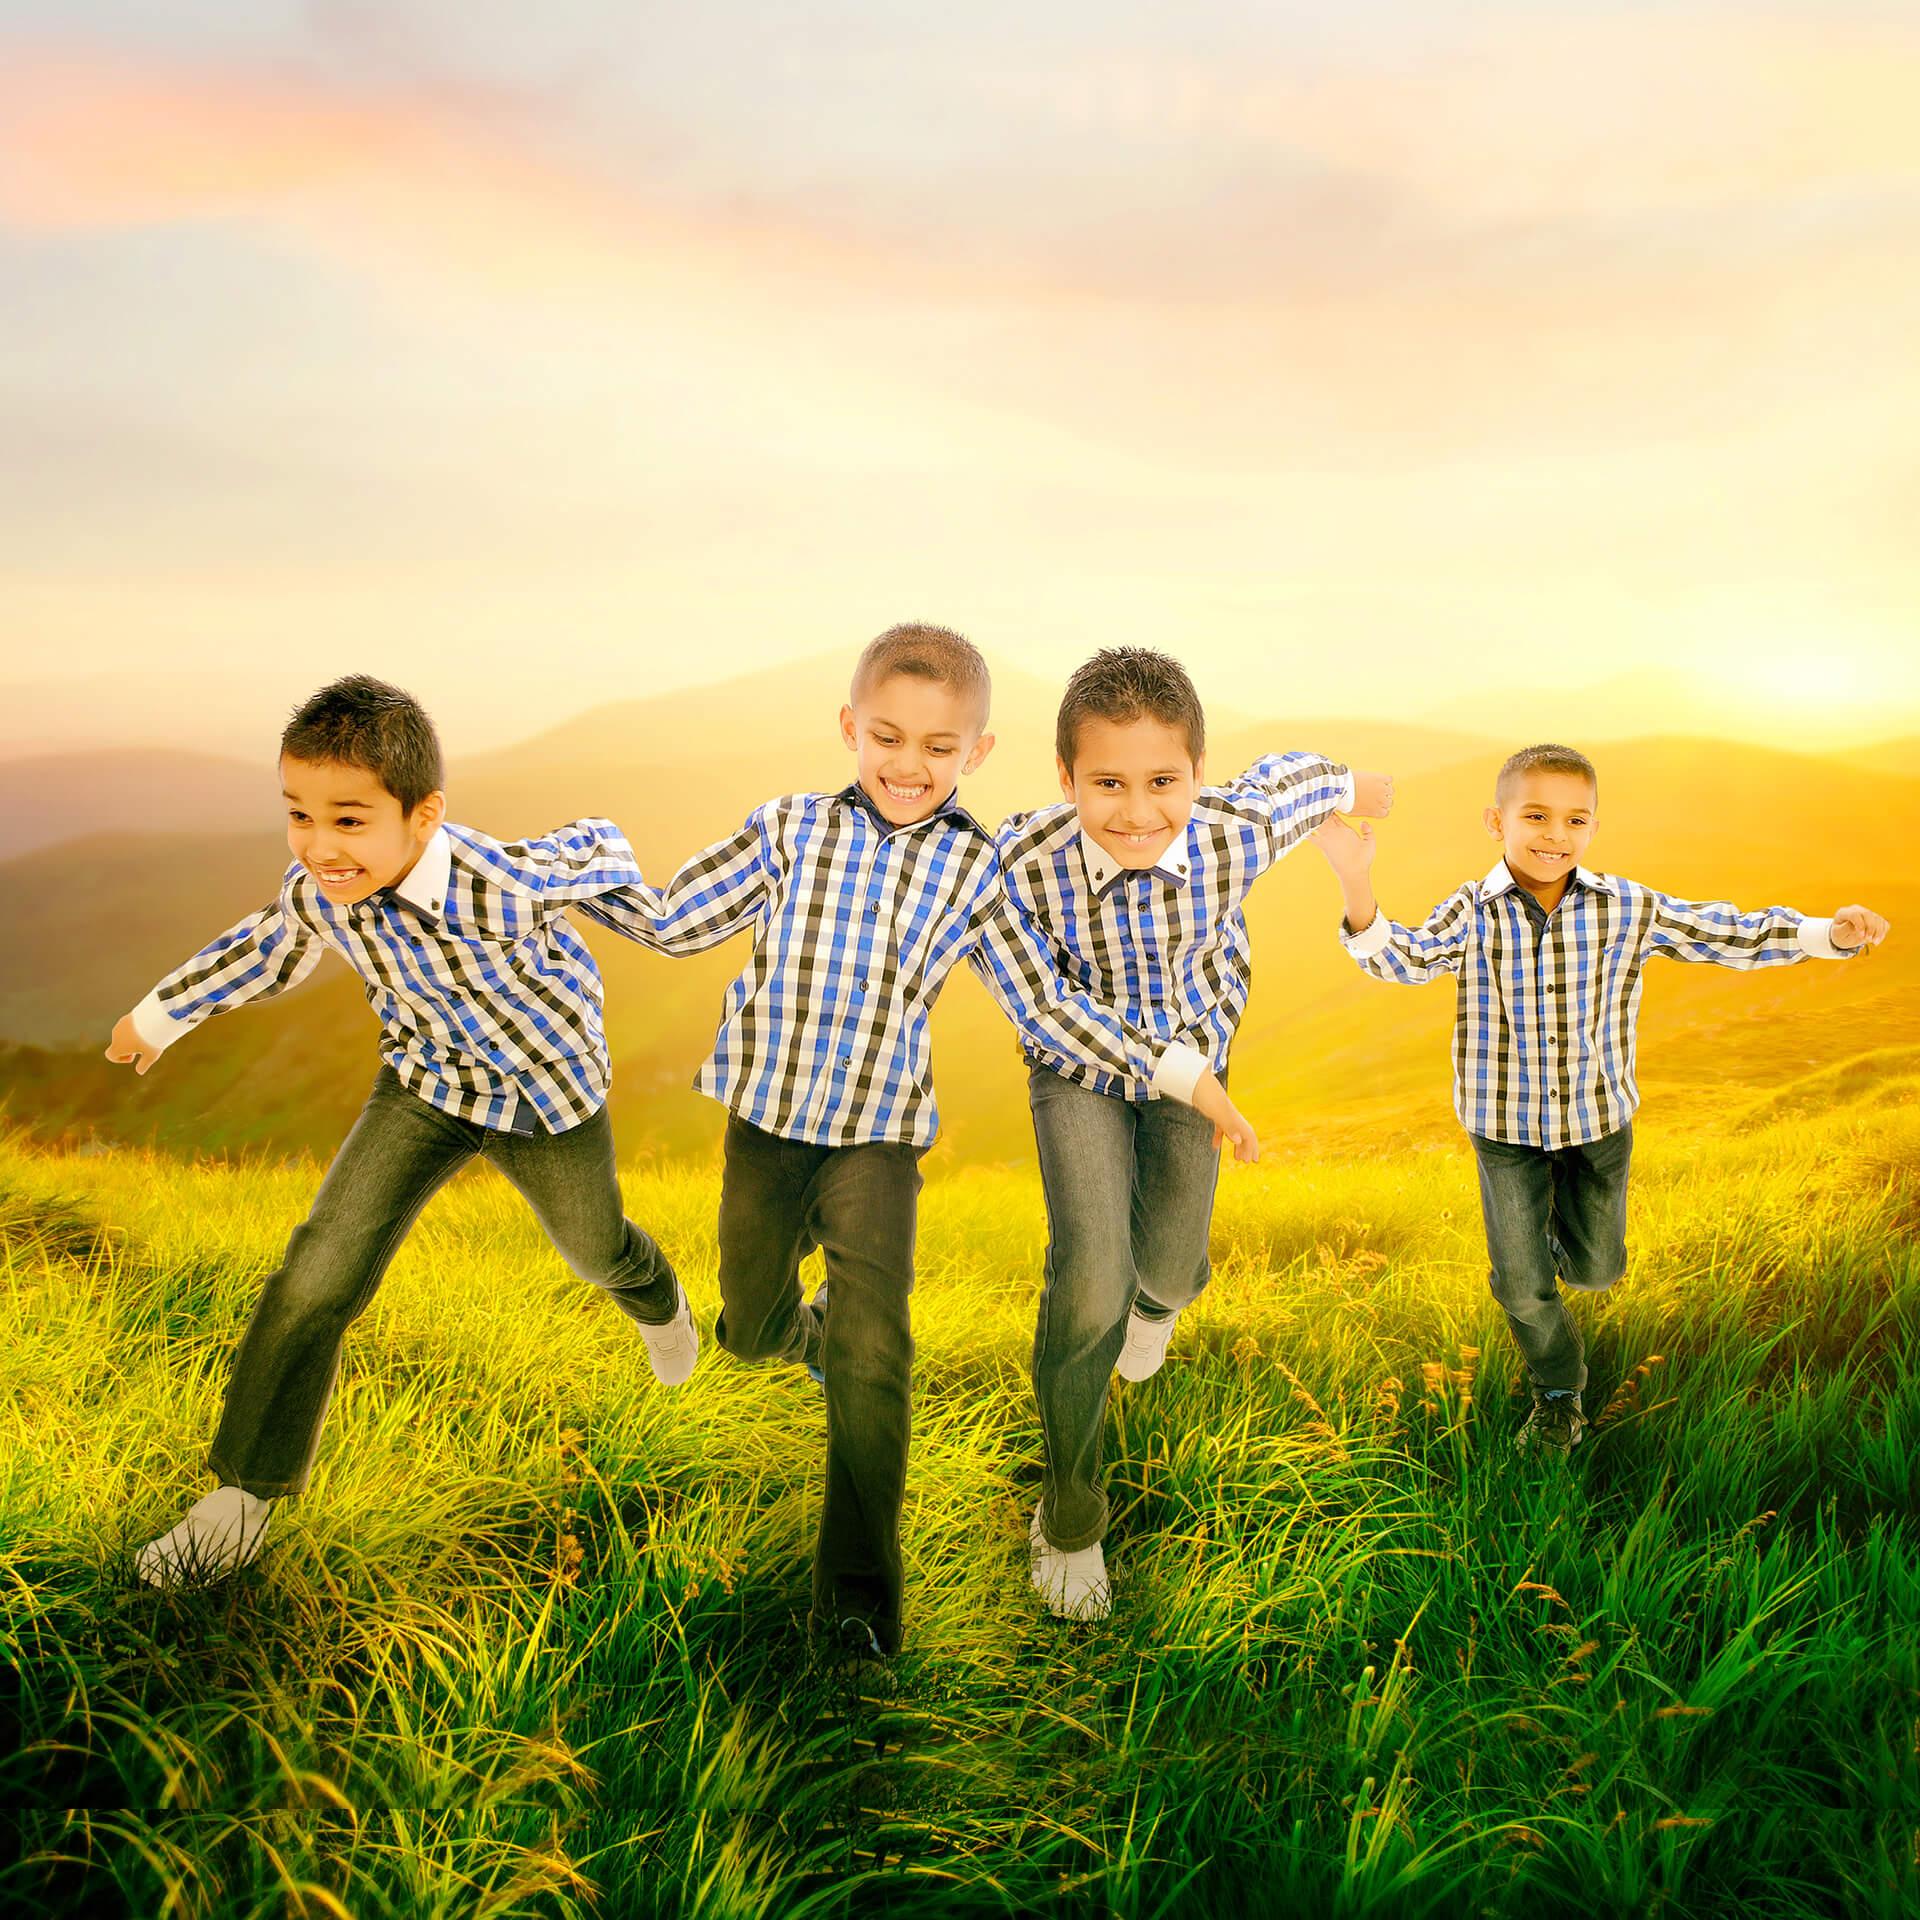 kids photoshoots in northamptons from kline studios